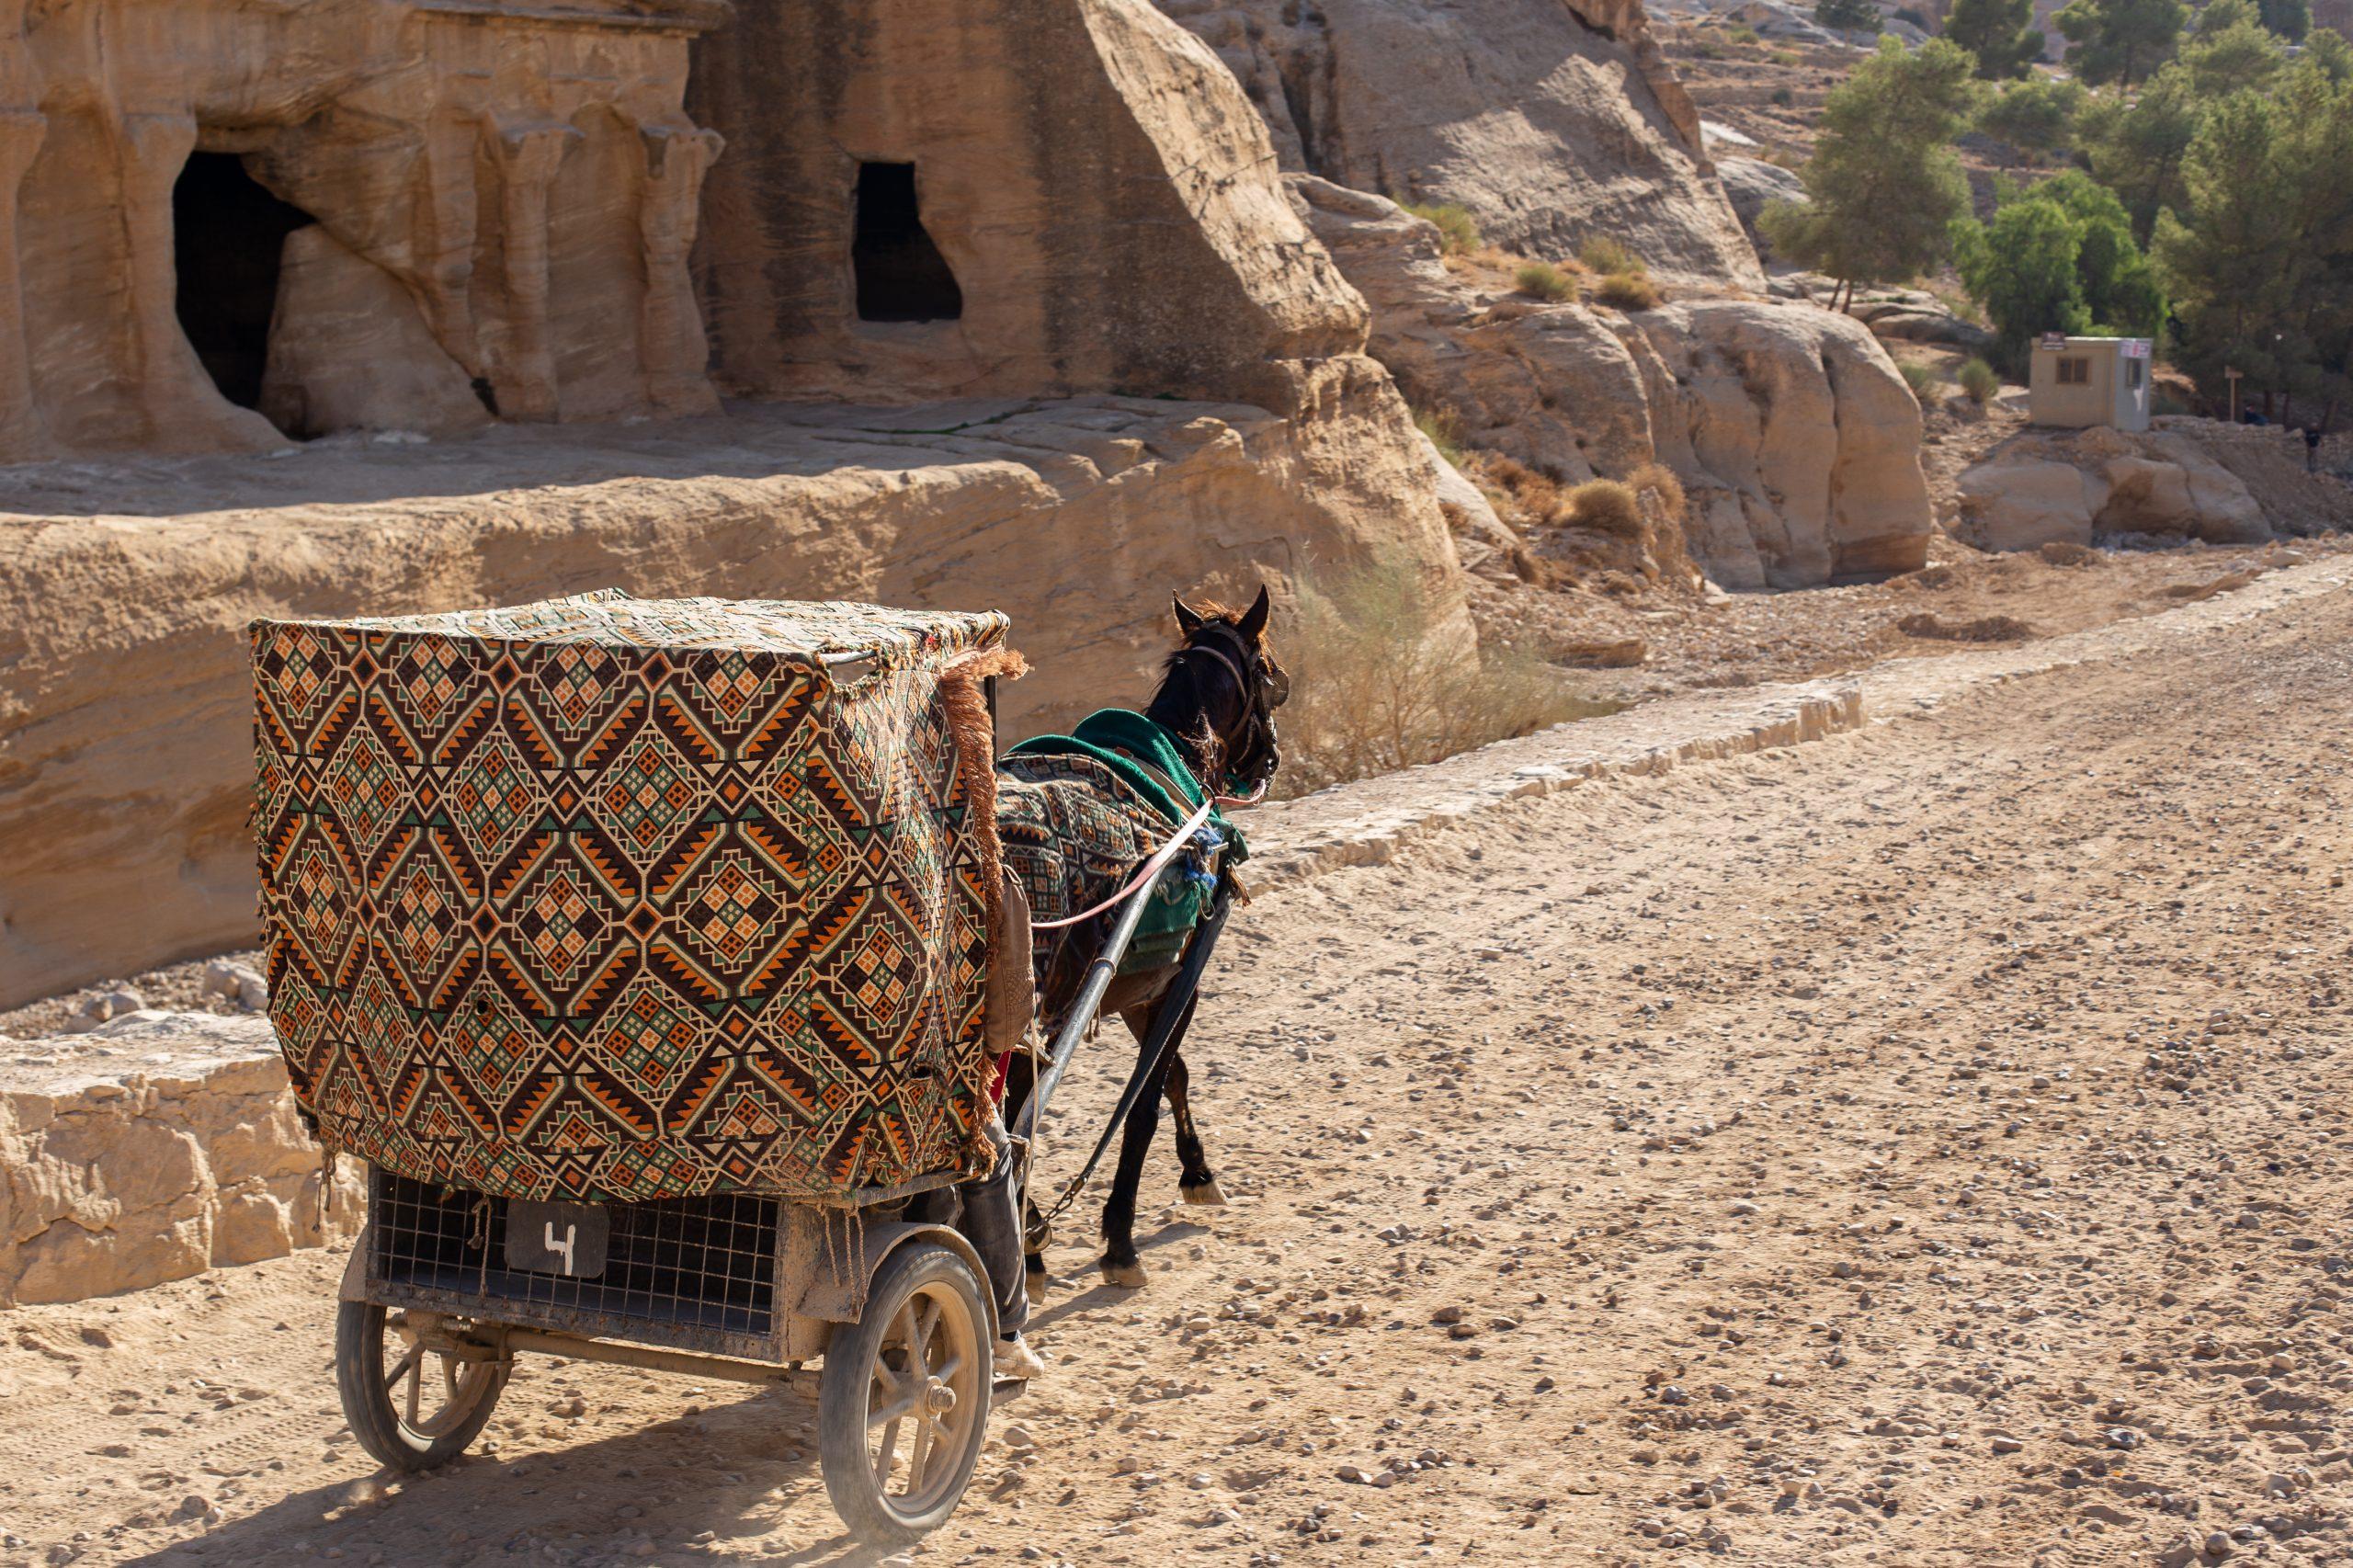 Petra Tour From Tel Aviv And Jerusalem - The Siq